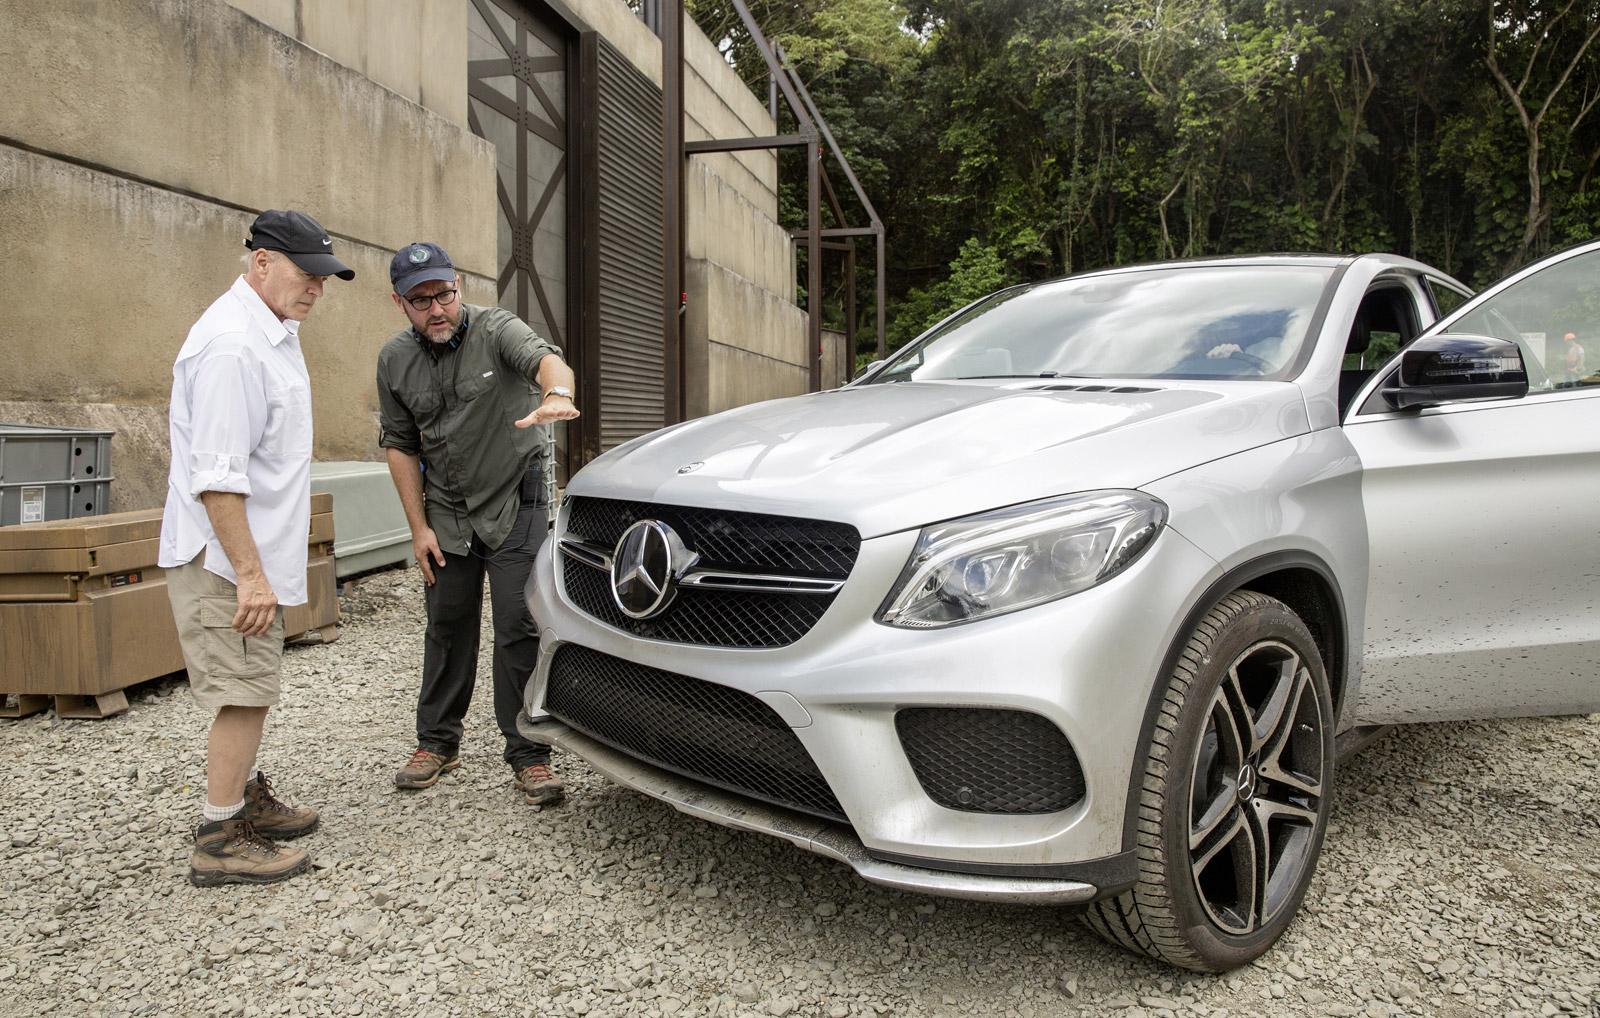 Mercedes GLE Coupe - luxury car